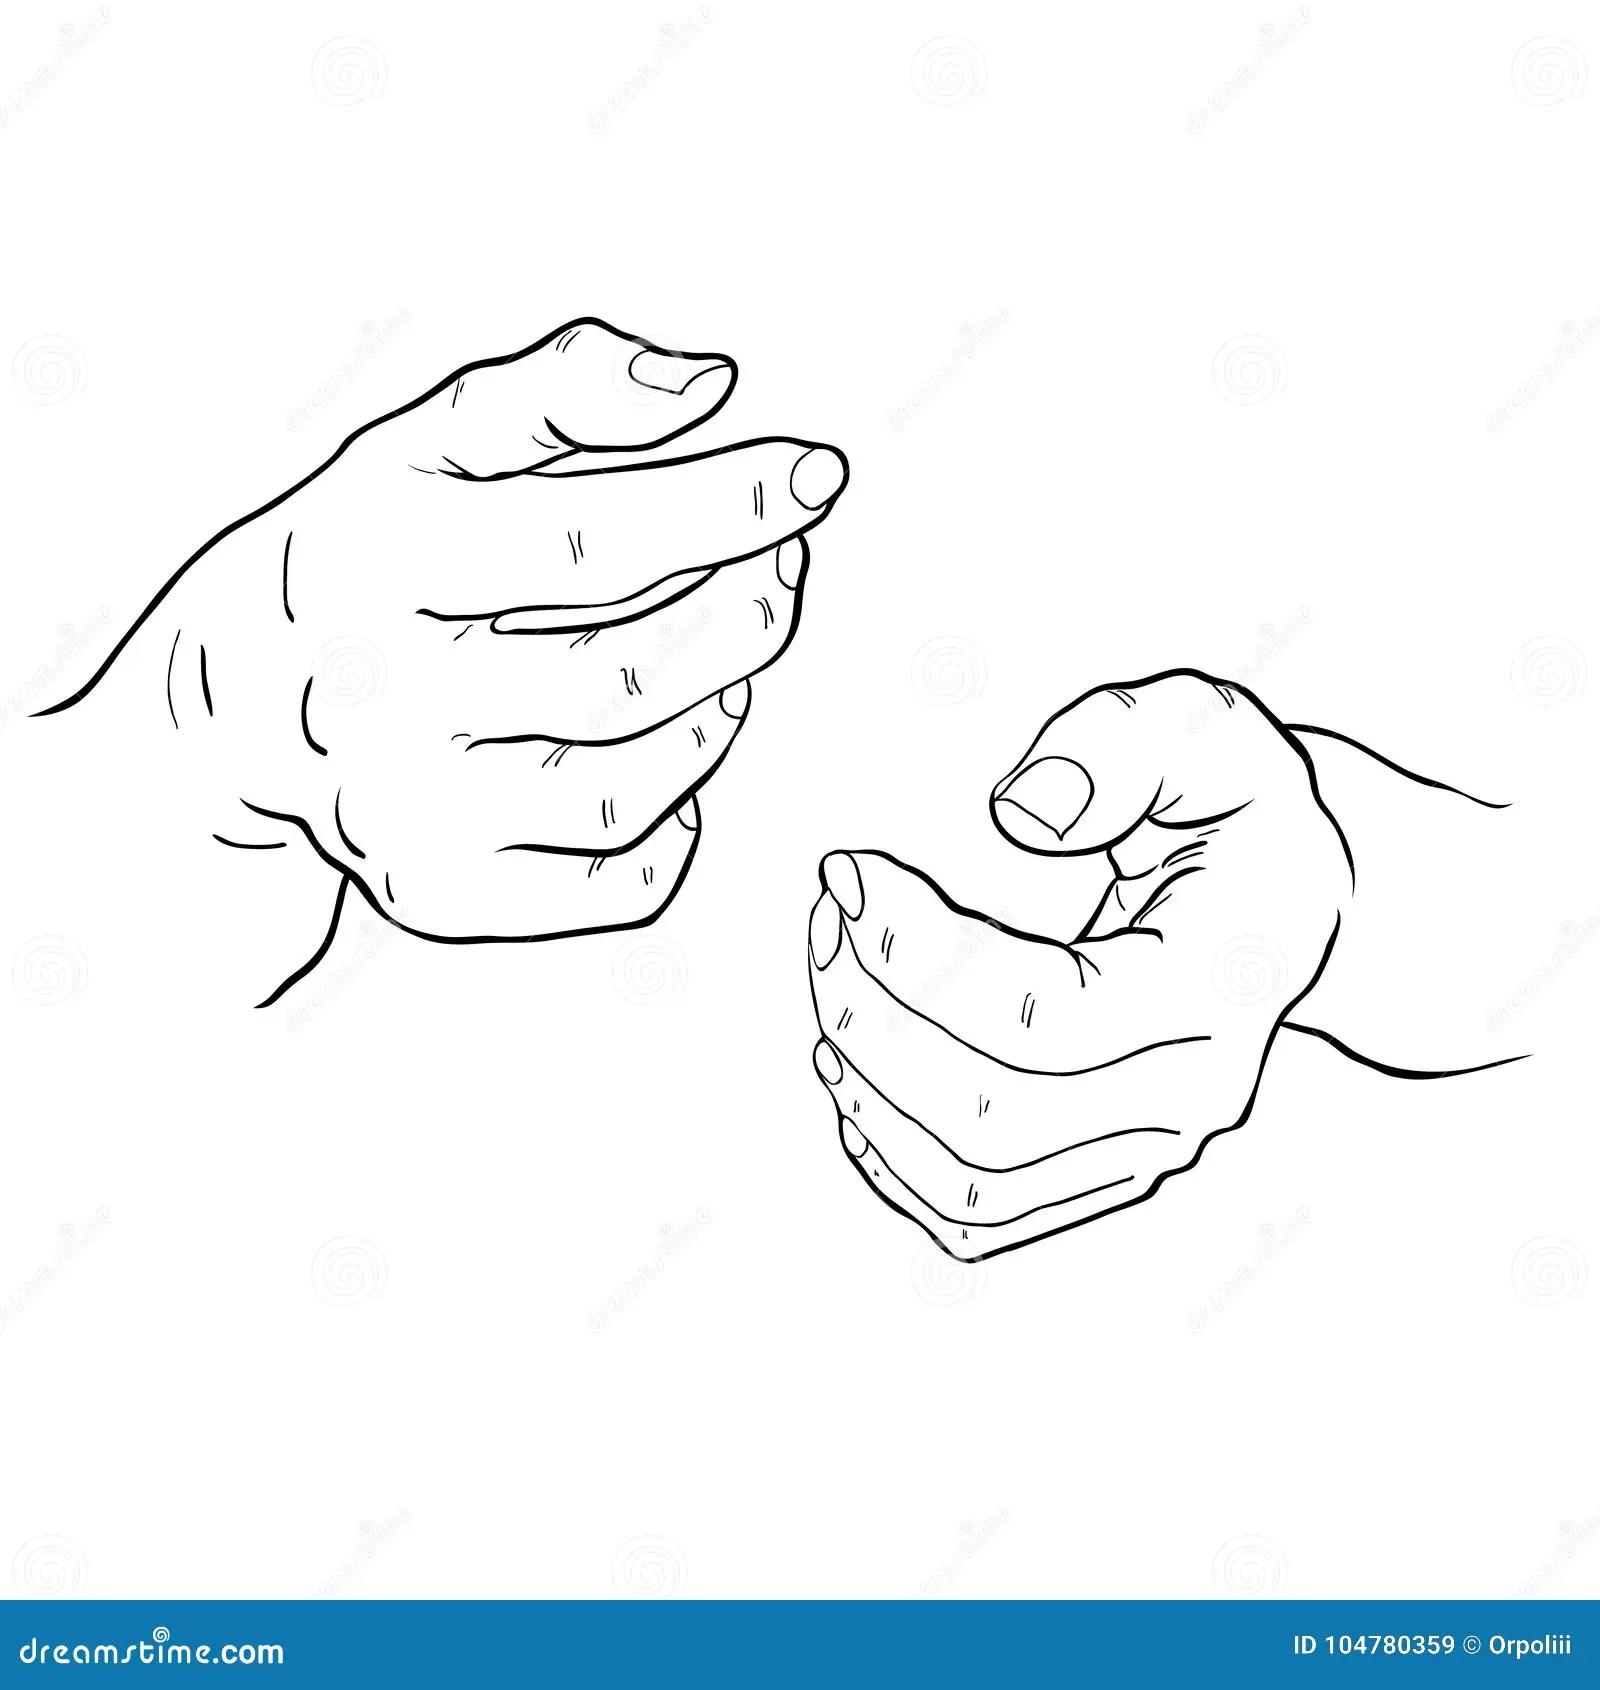 Coloring Hand Man S Bent Fingers Vector Illustration